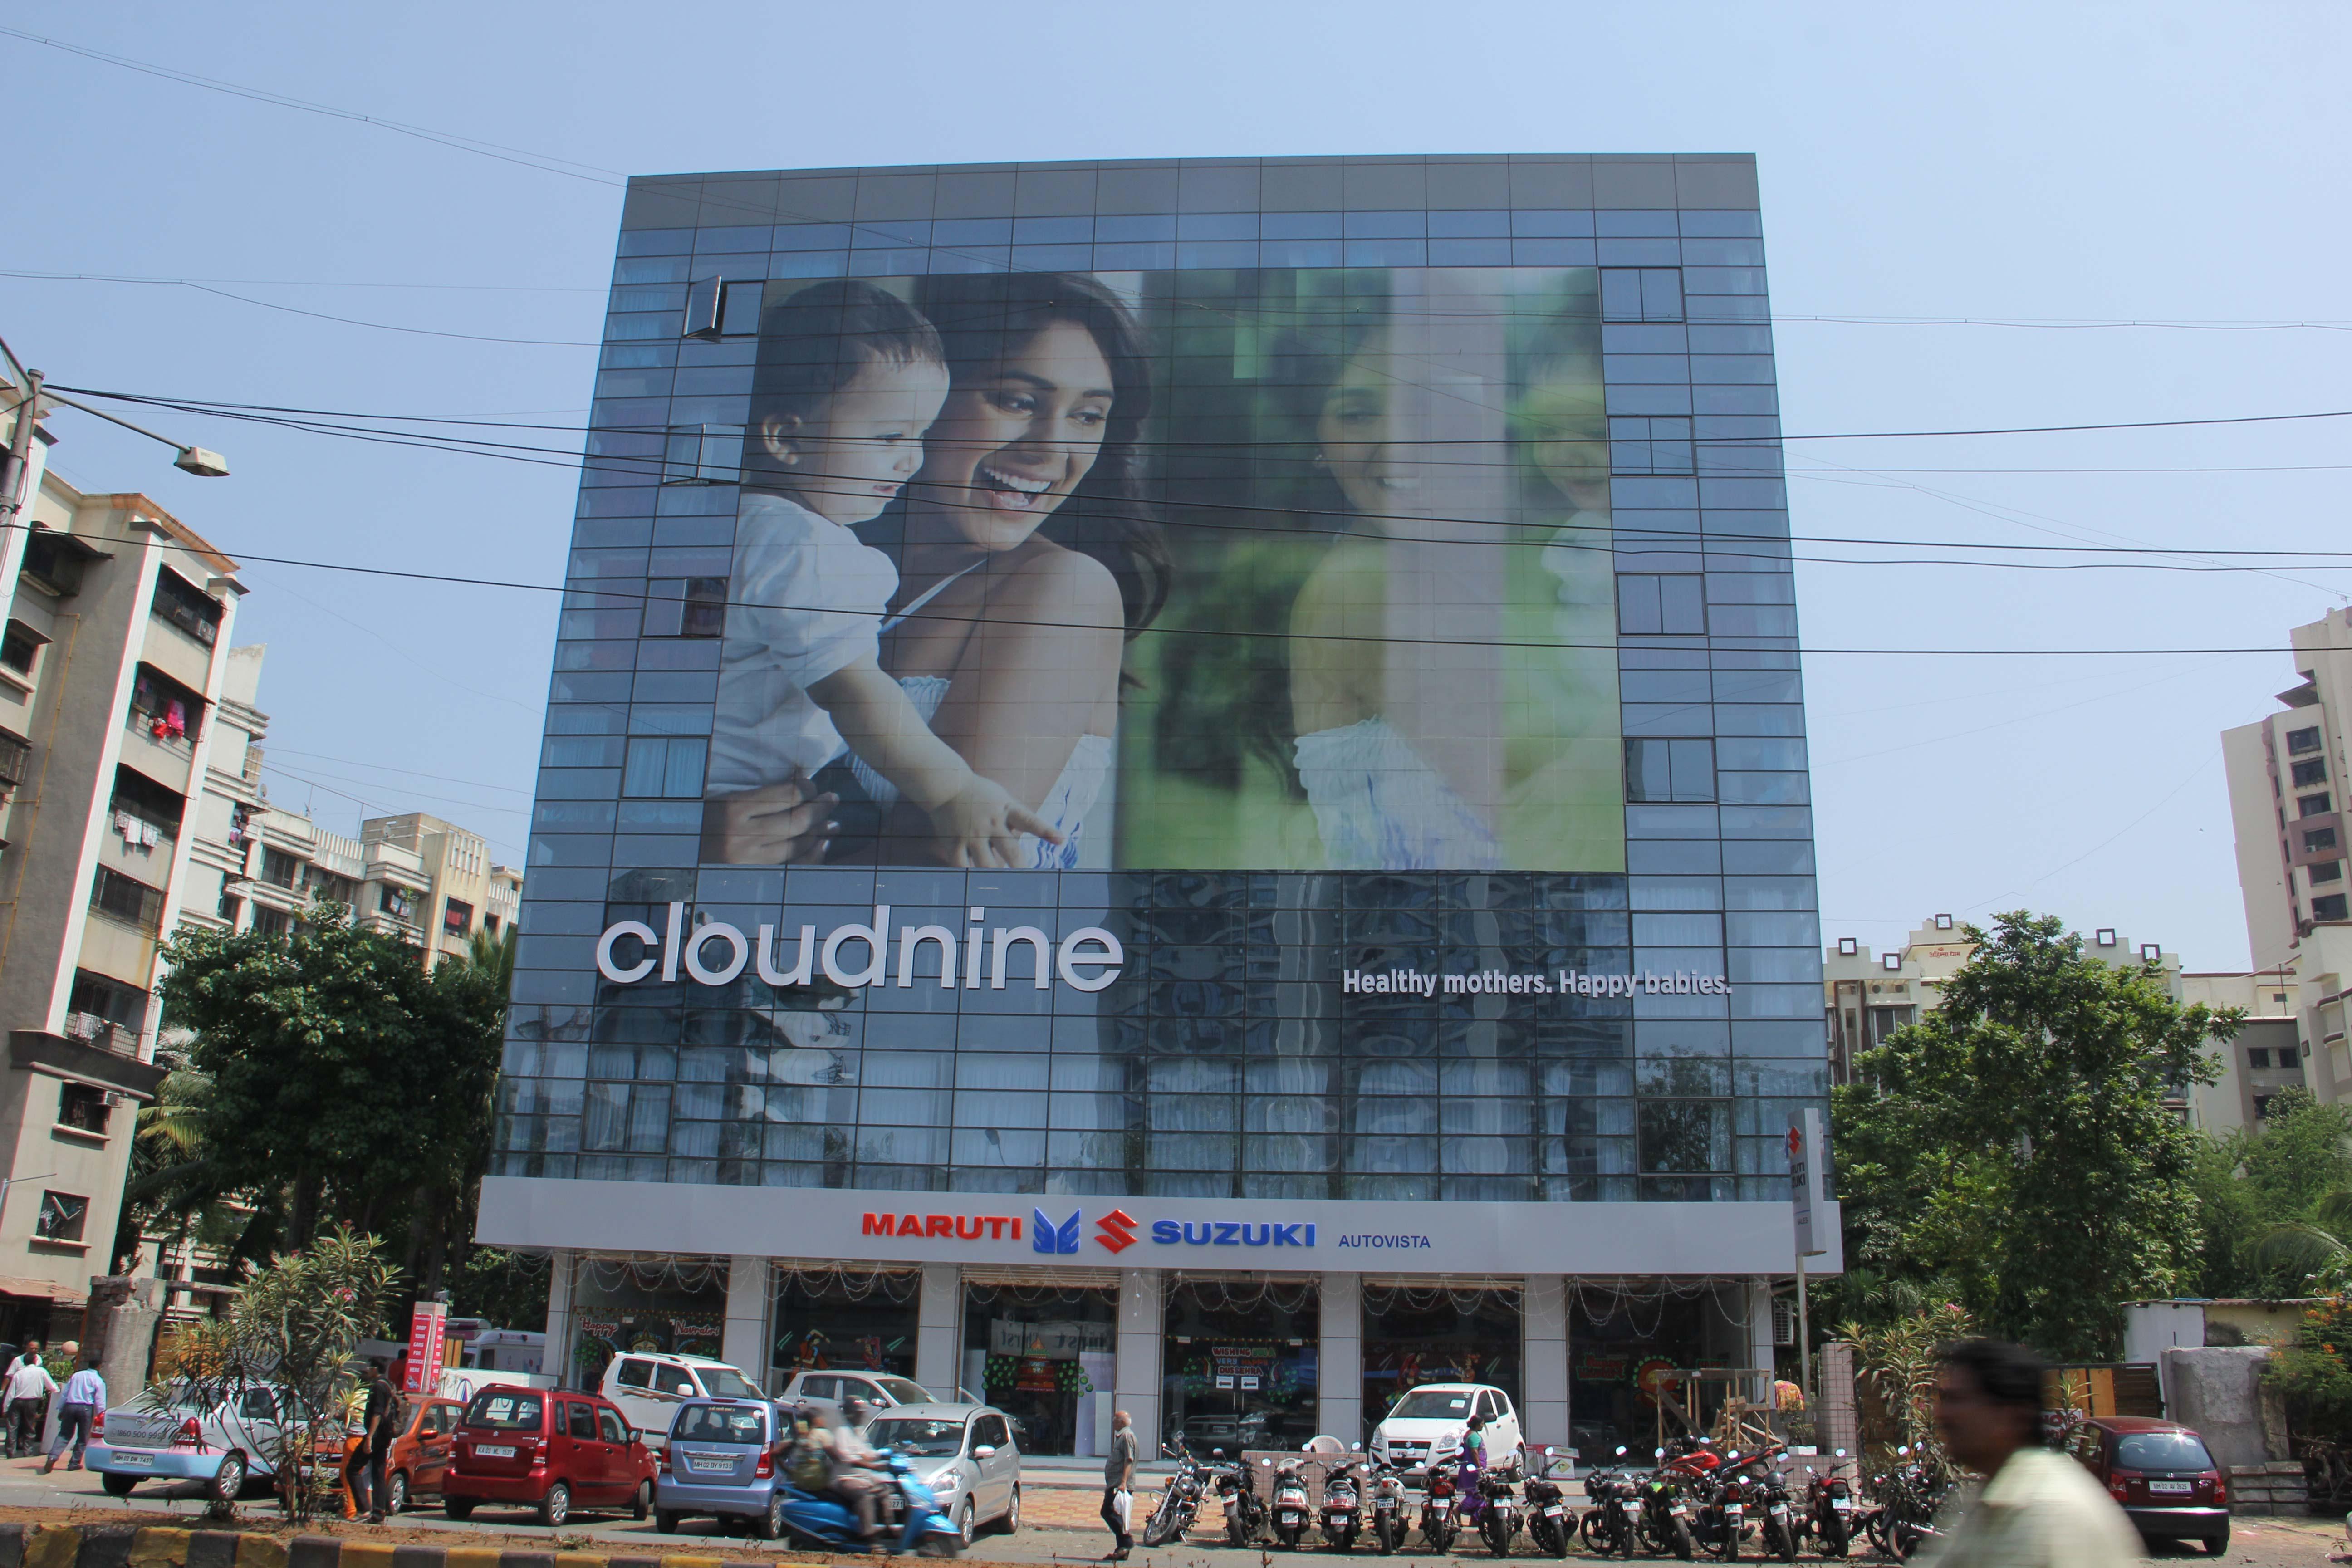 Cloudnine Hospital